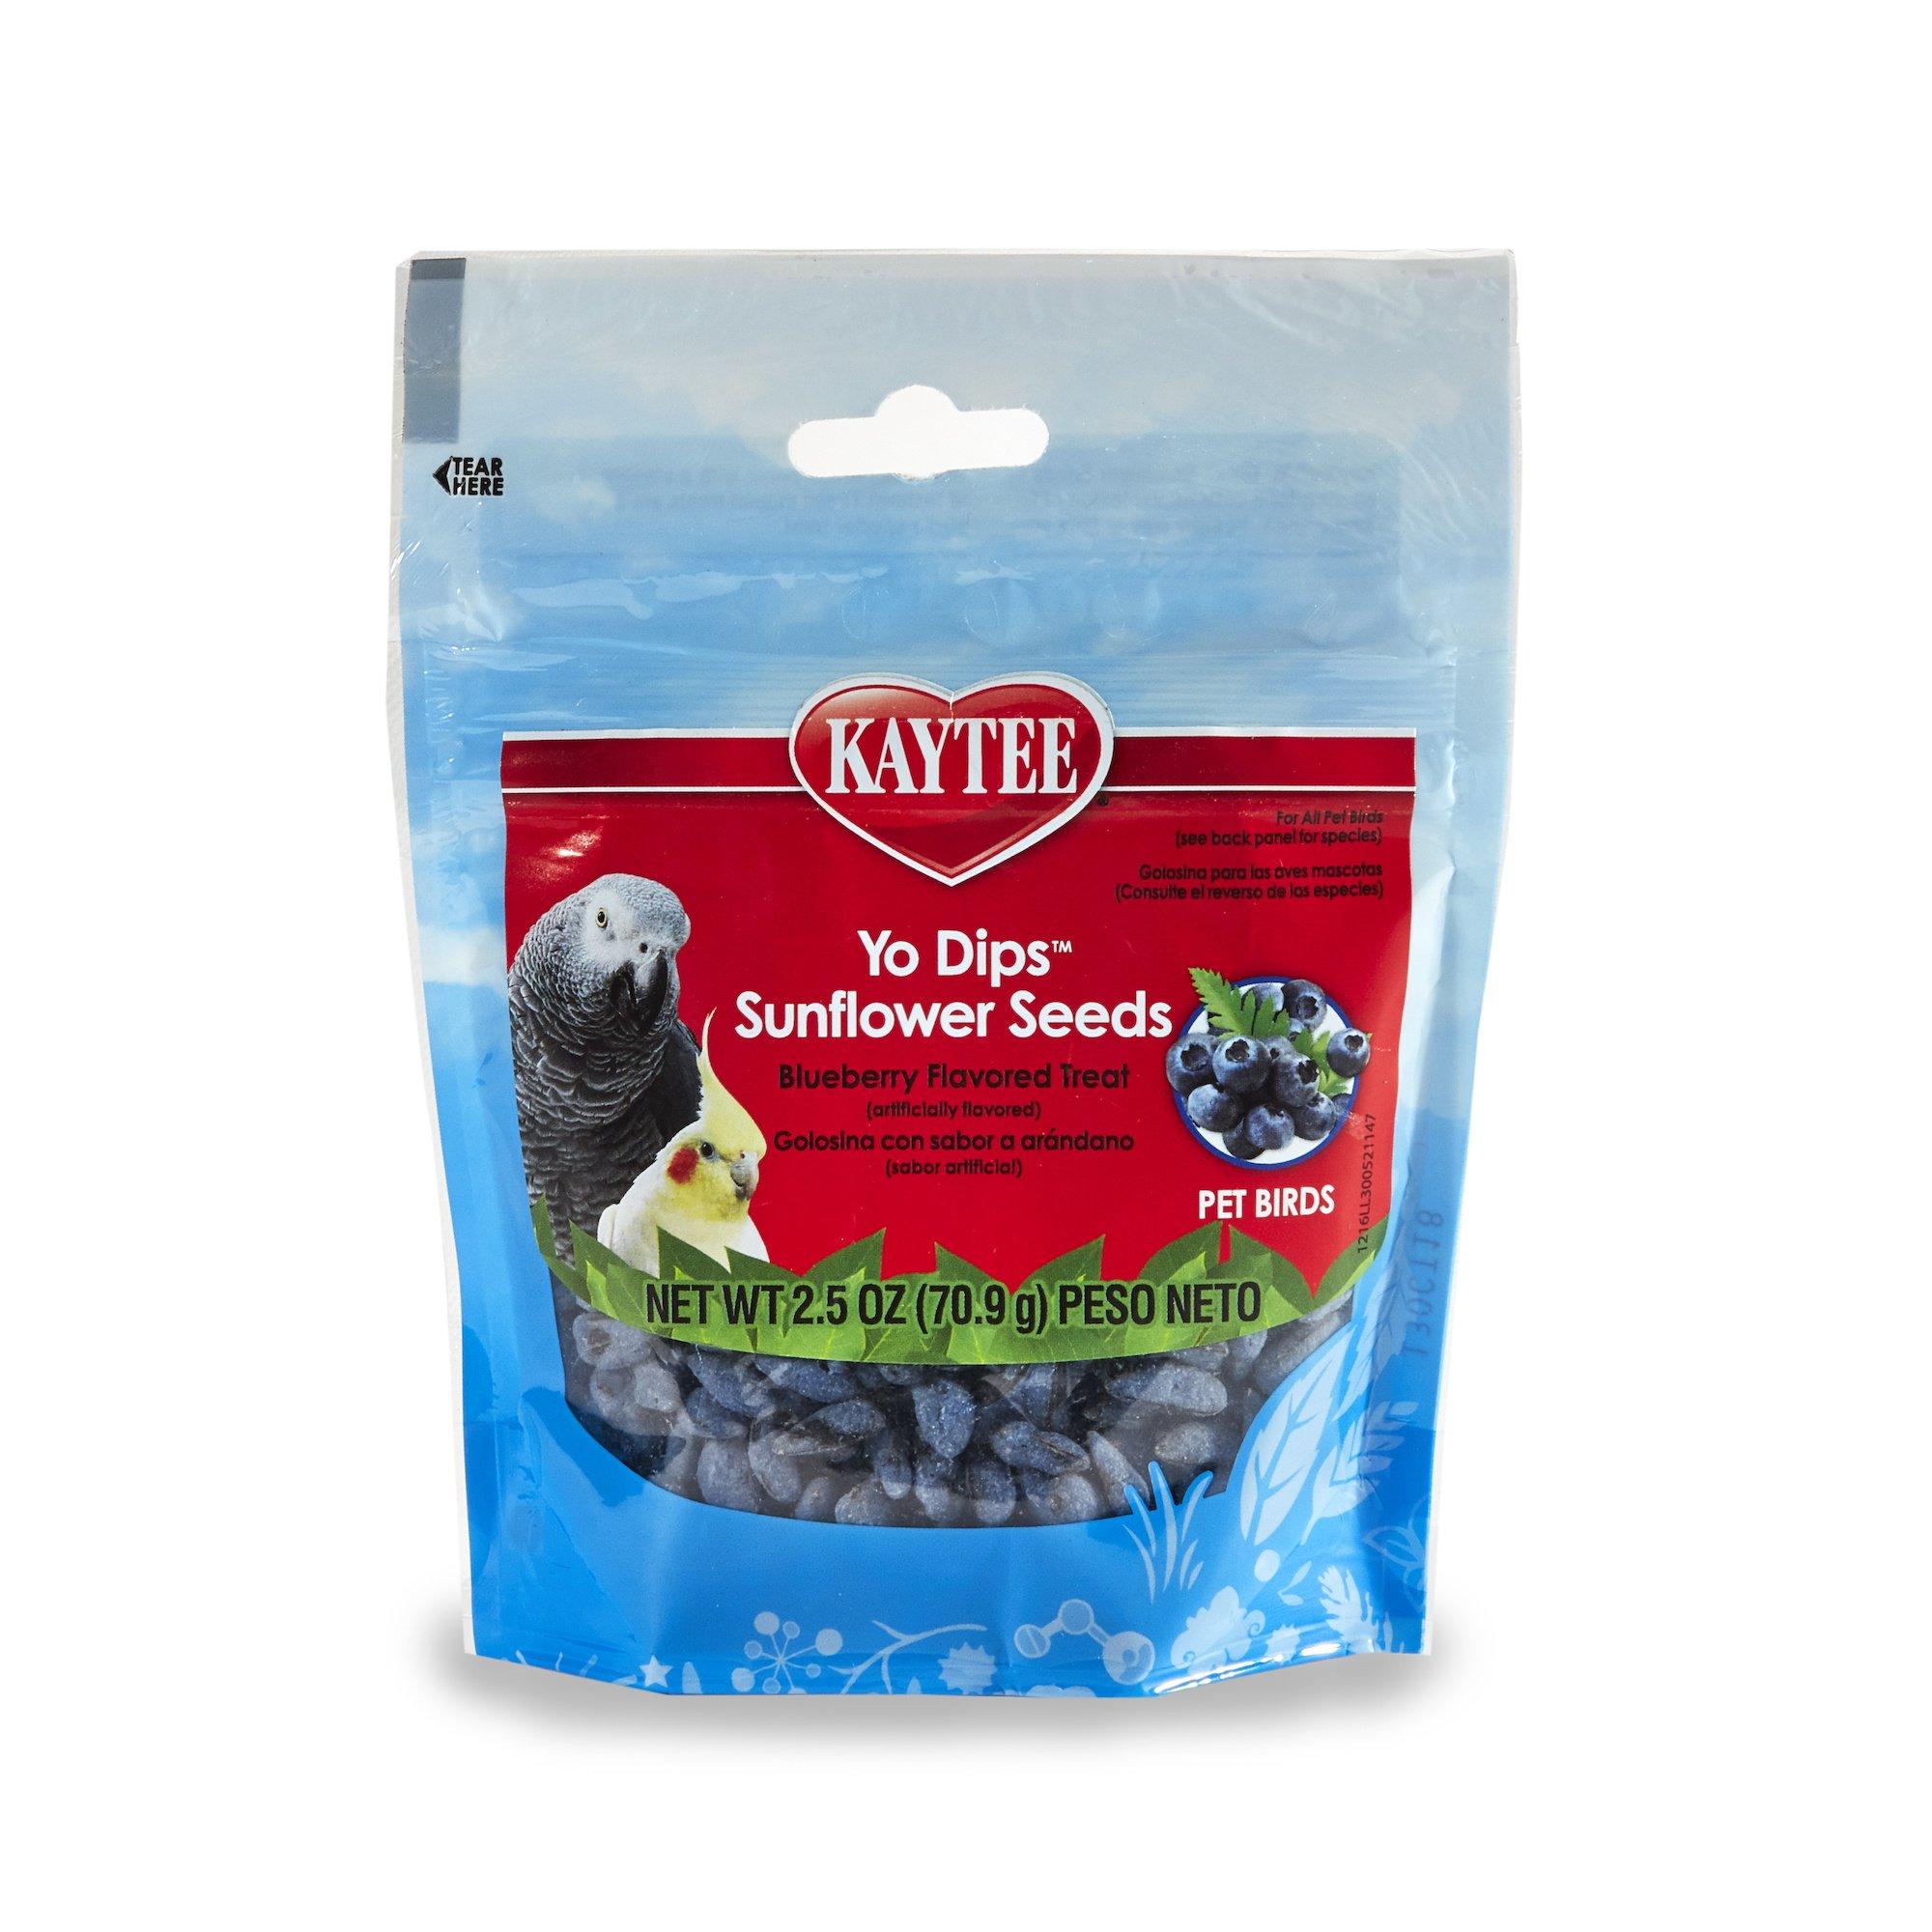 Kaytee Blueberry Flavored Yogurt Dipped Sunflower Seeds For Birds Treat